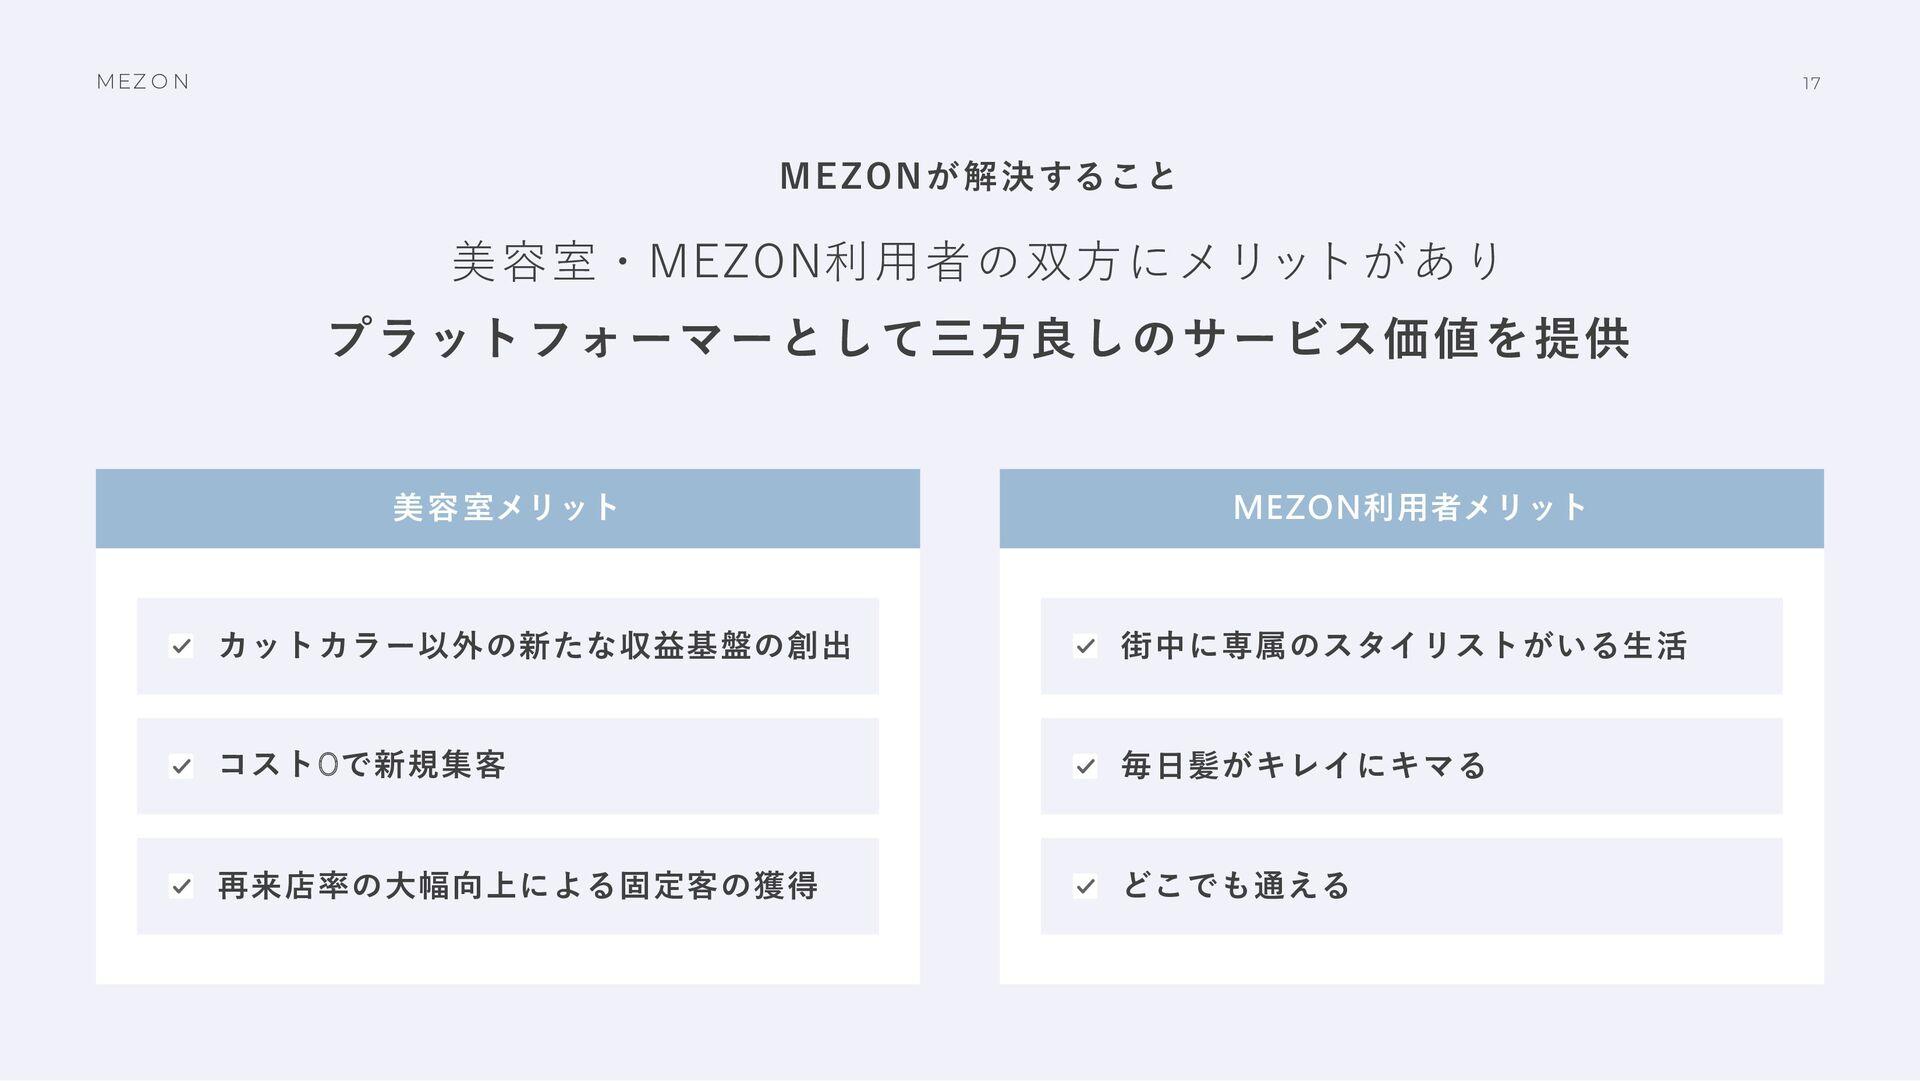 MEZ O N 16 美容室の役割を再定義し、新たな市場を創ります カット・カラー市場 約2 ...